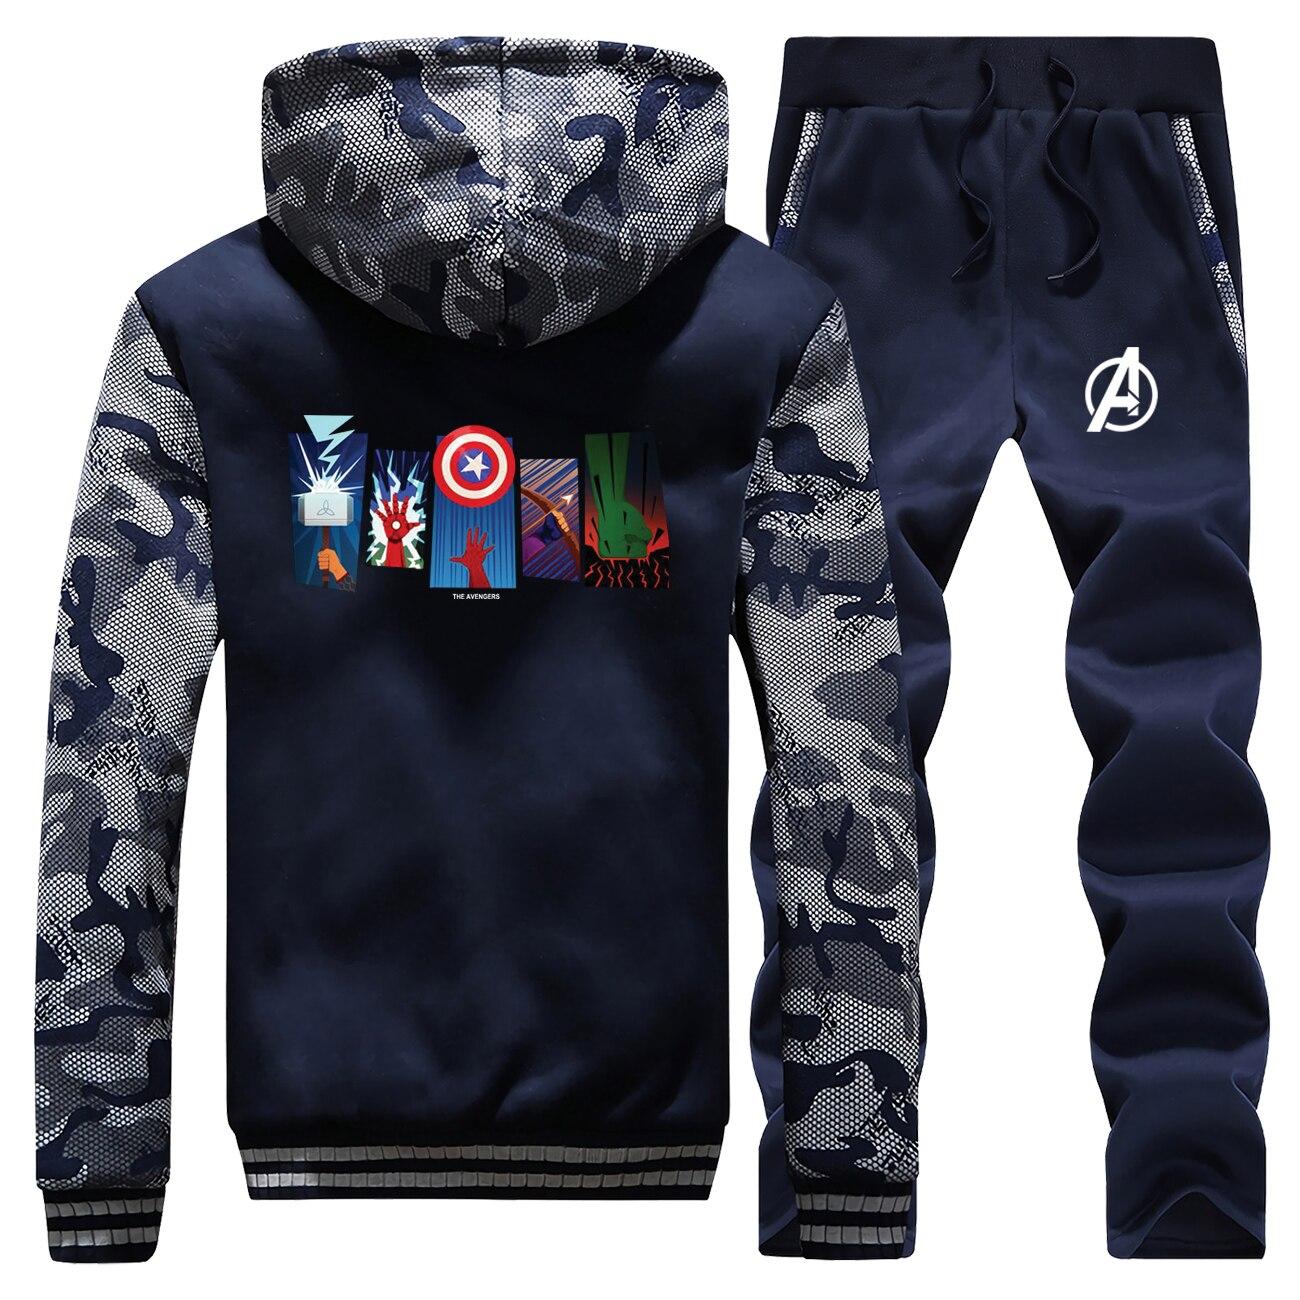 The Avengers Hot Sale Winter 2019 Hoodies Mens Camouflage Sweatshirts Suit Warm Jacket Long Sleeve Coat Thick+Pants 2 Piece Set